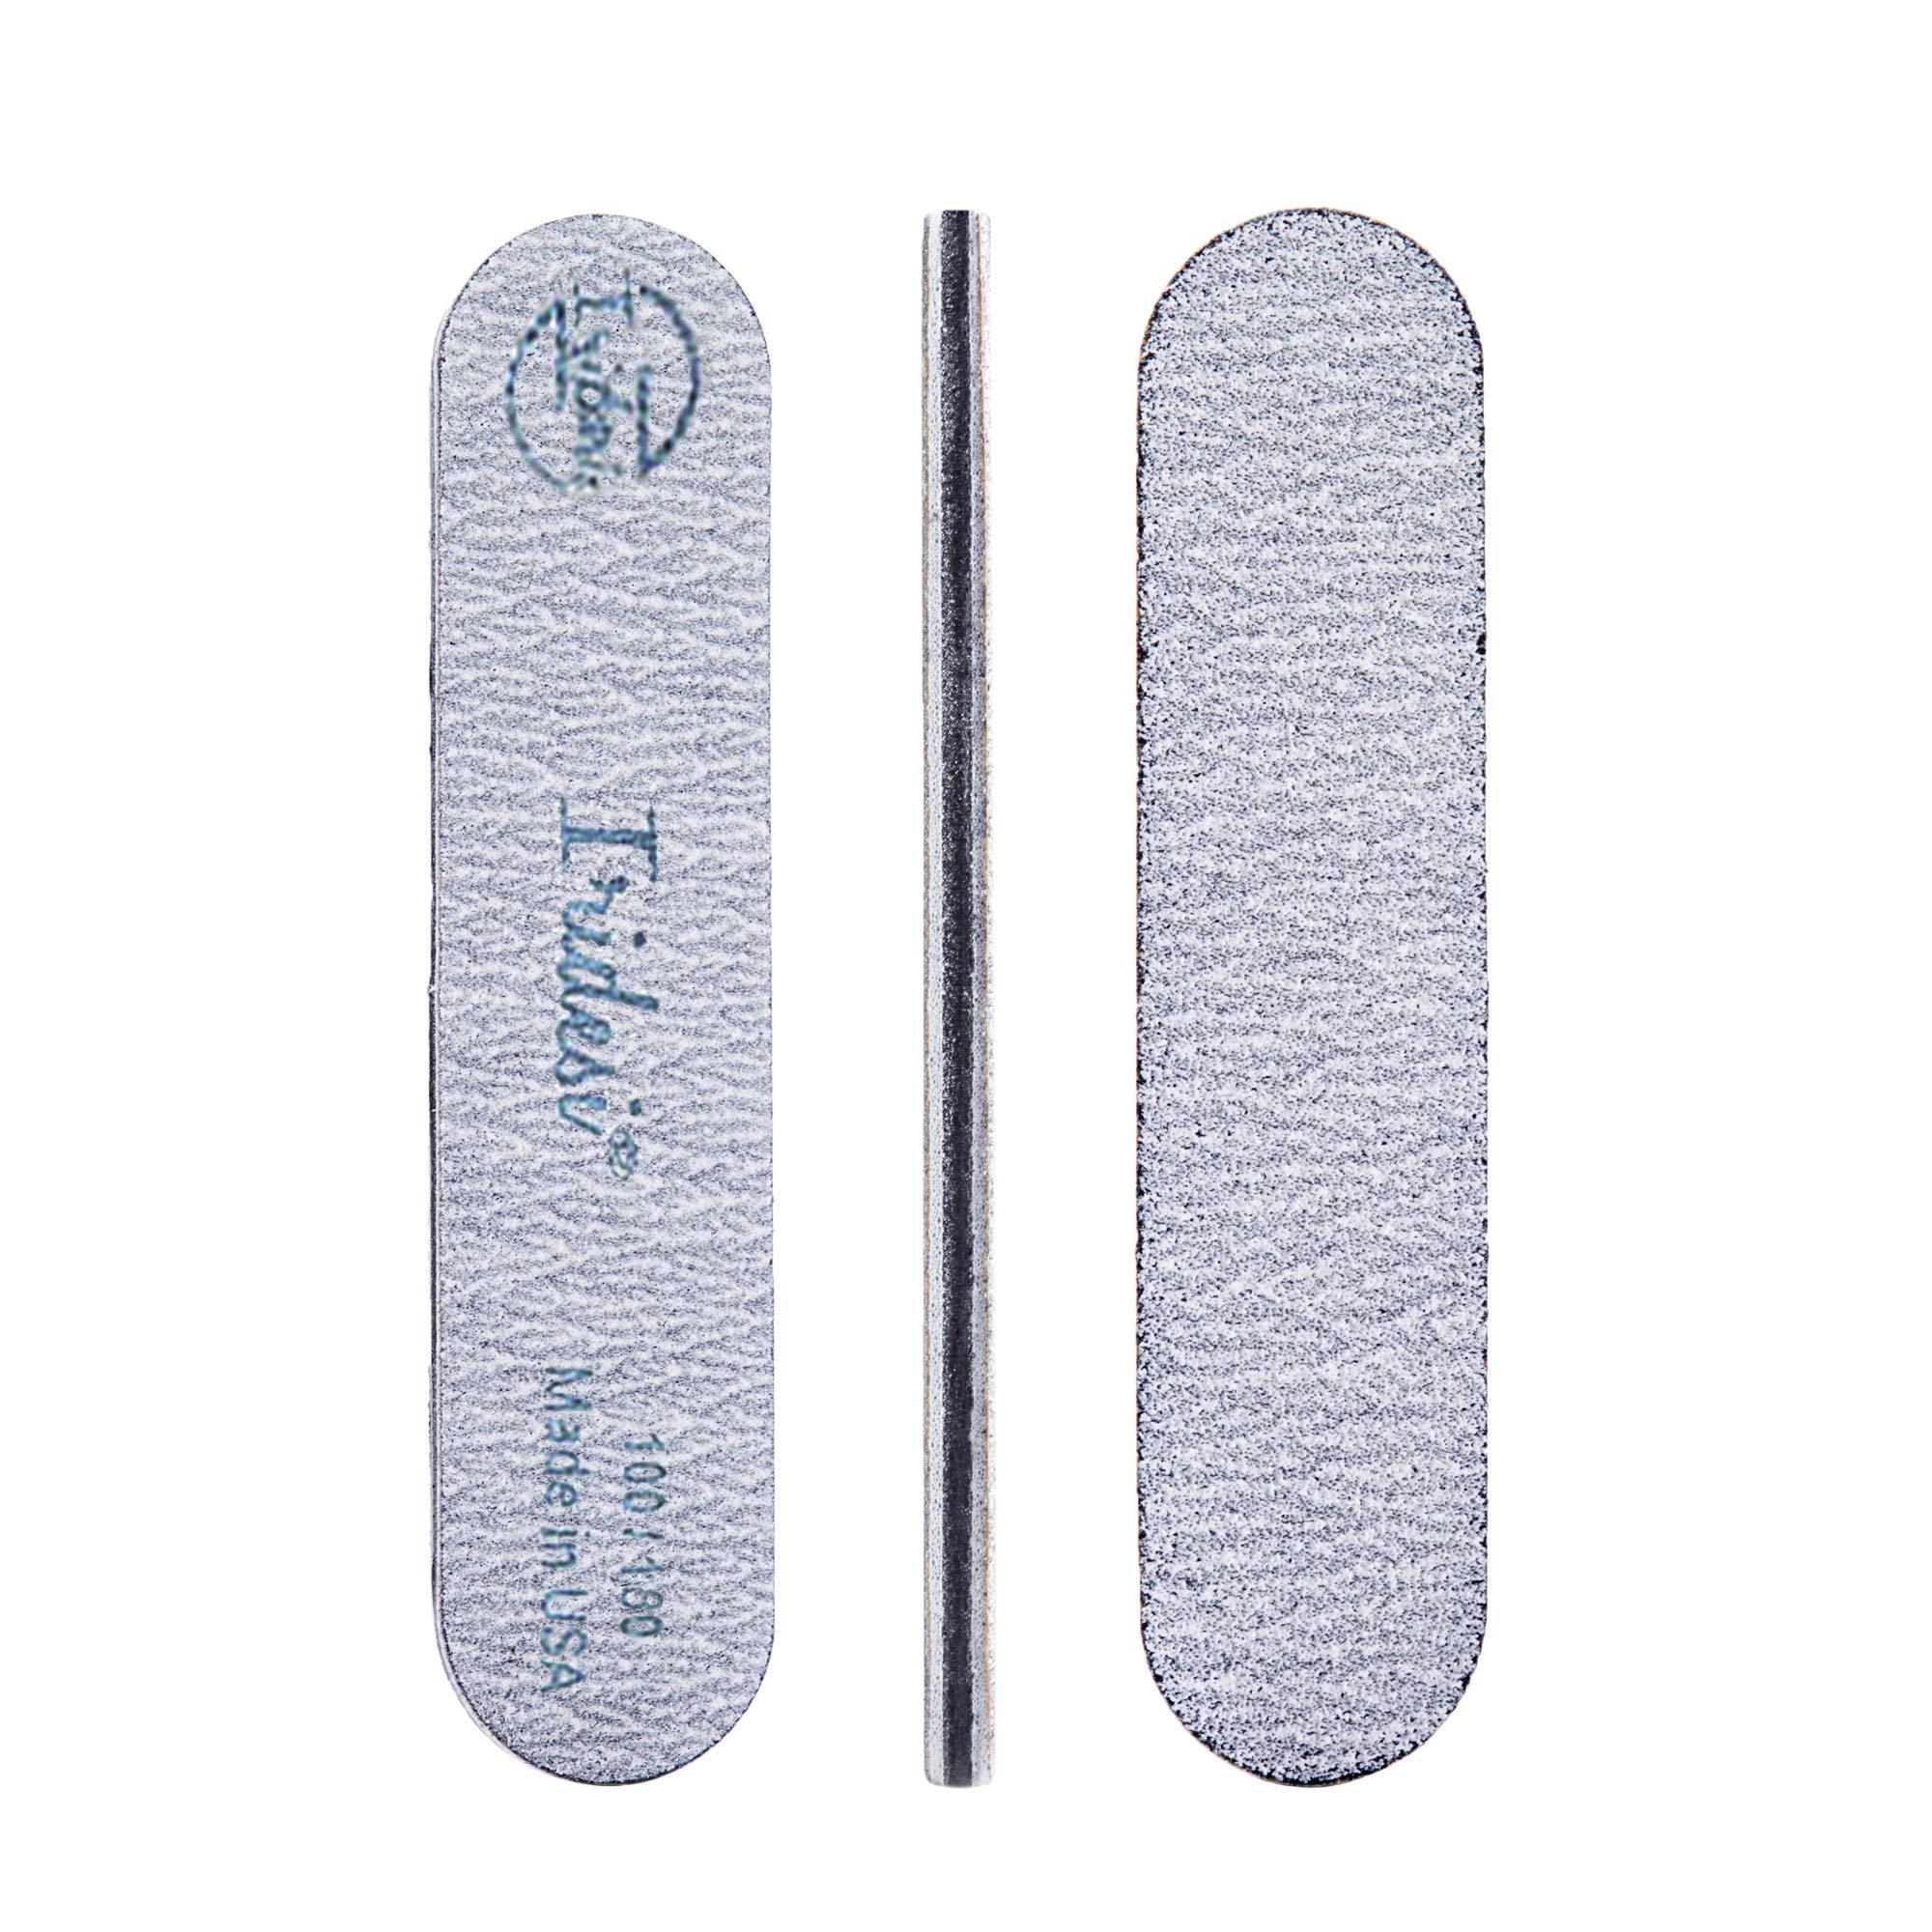 Iridesi Mini Zebra Nail File 100 180 Emery Boards 3.5 Inches Long By .75 Inches Wide Fingernail Filers Per Pack 50 by Iridesi